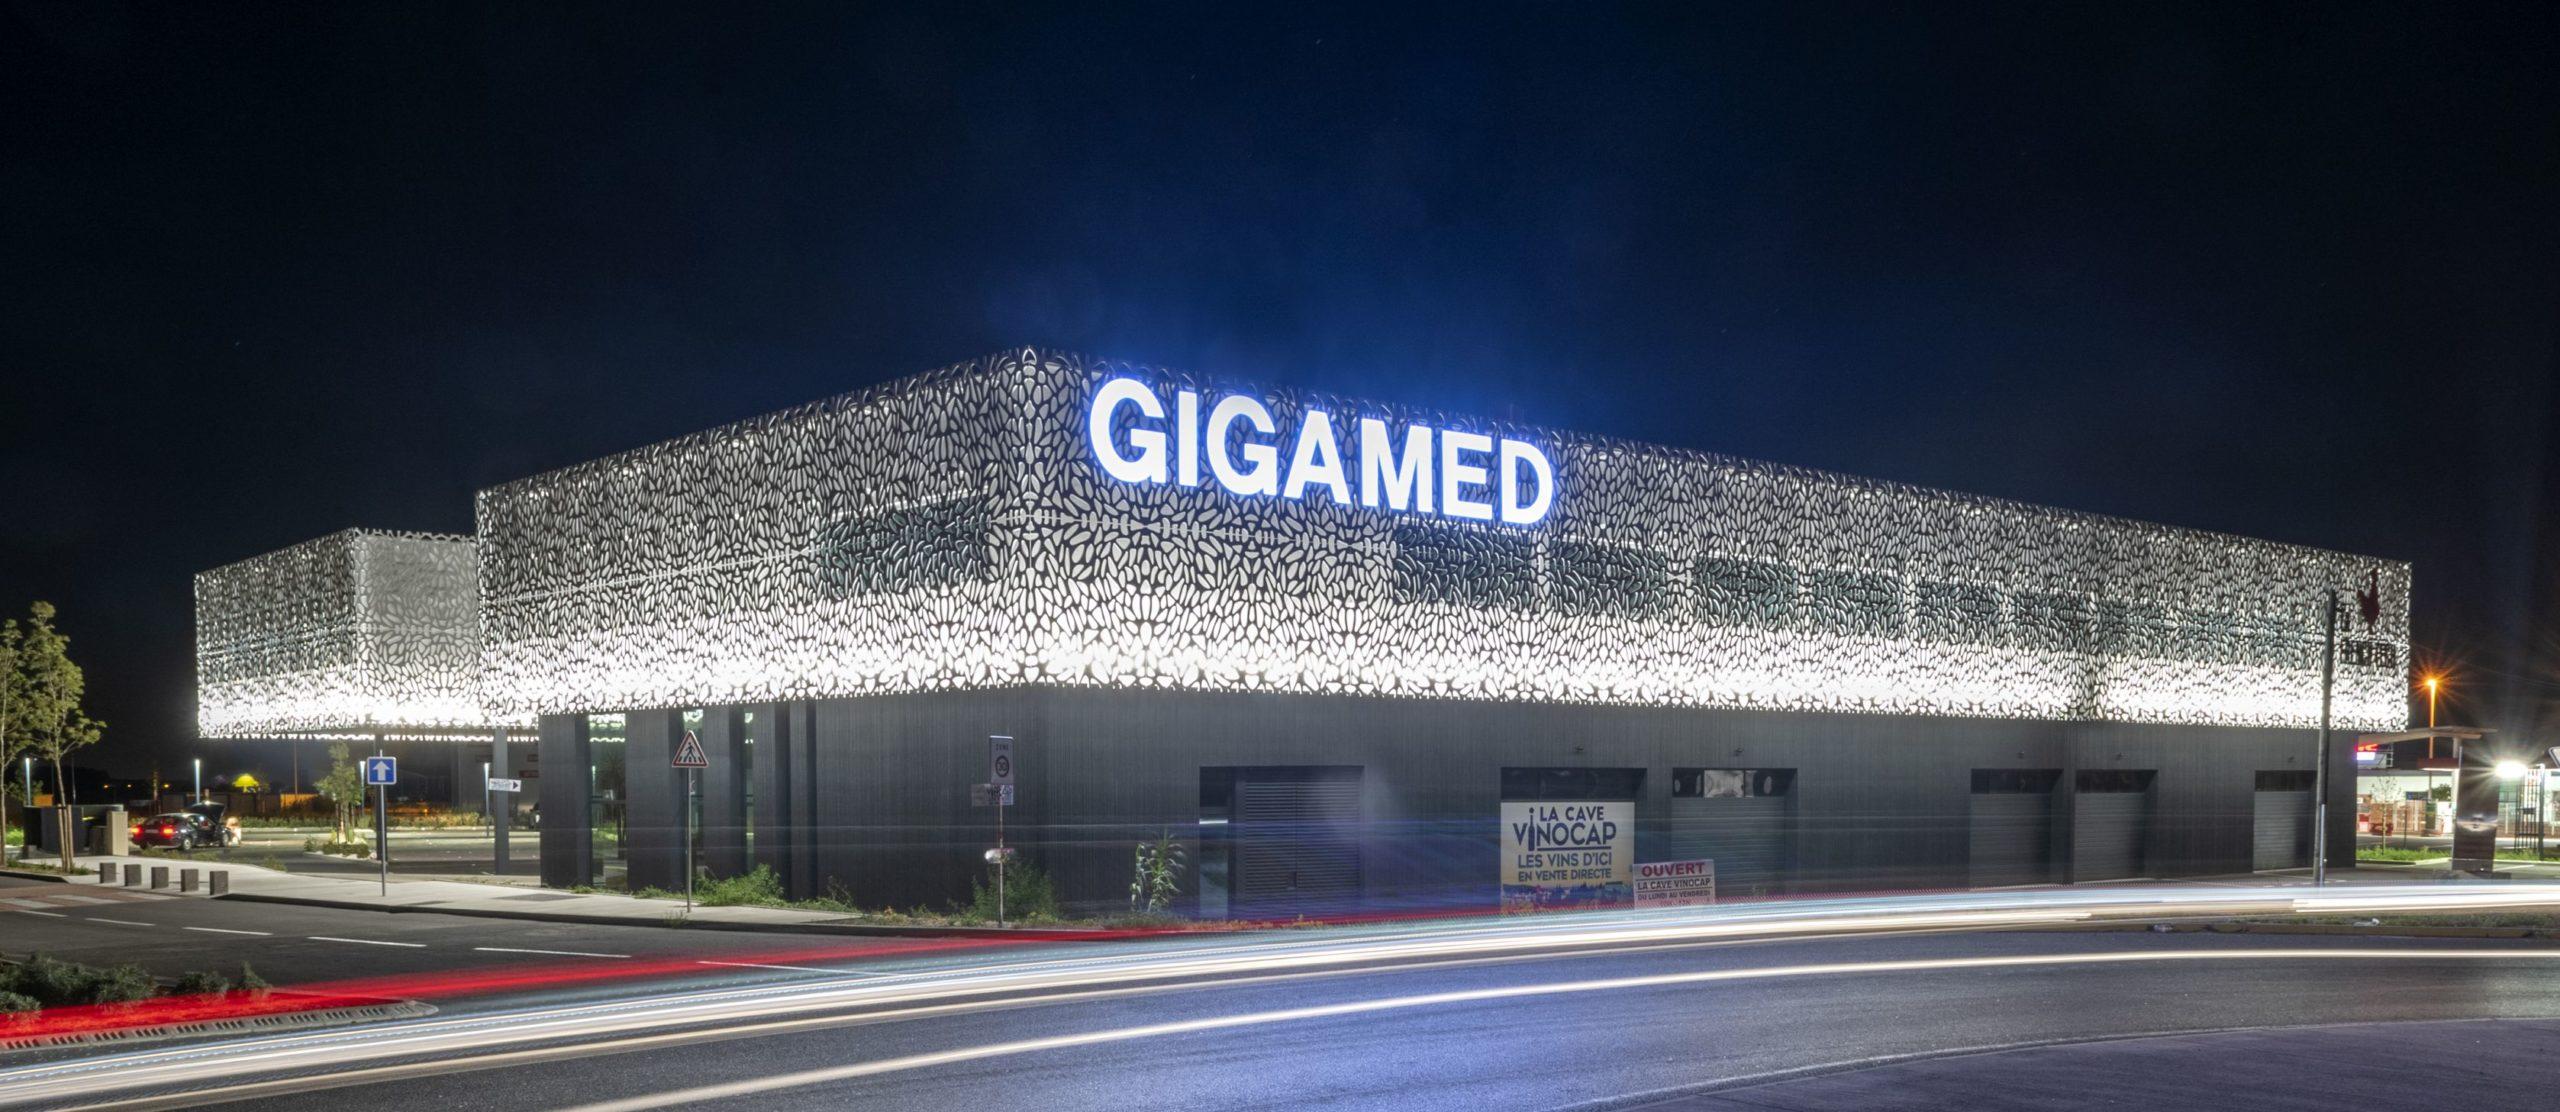 Pépinière GIGAMED - Bessan 2